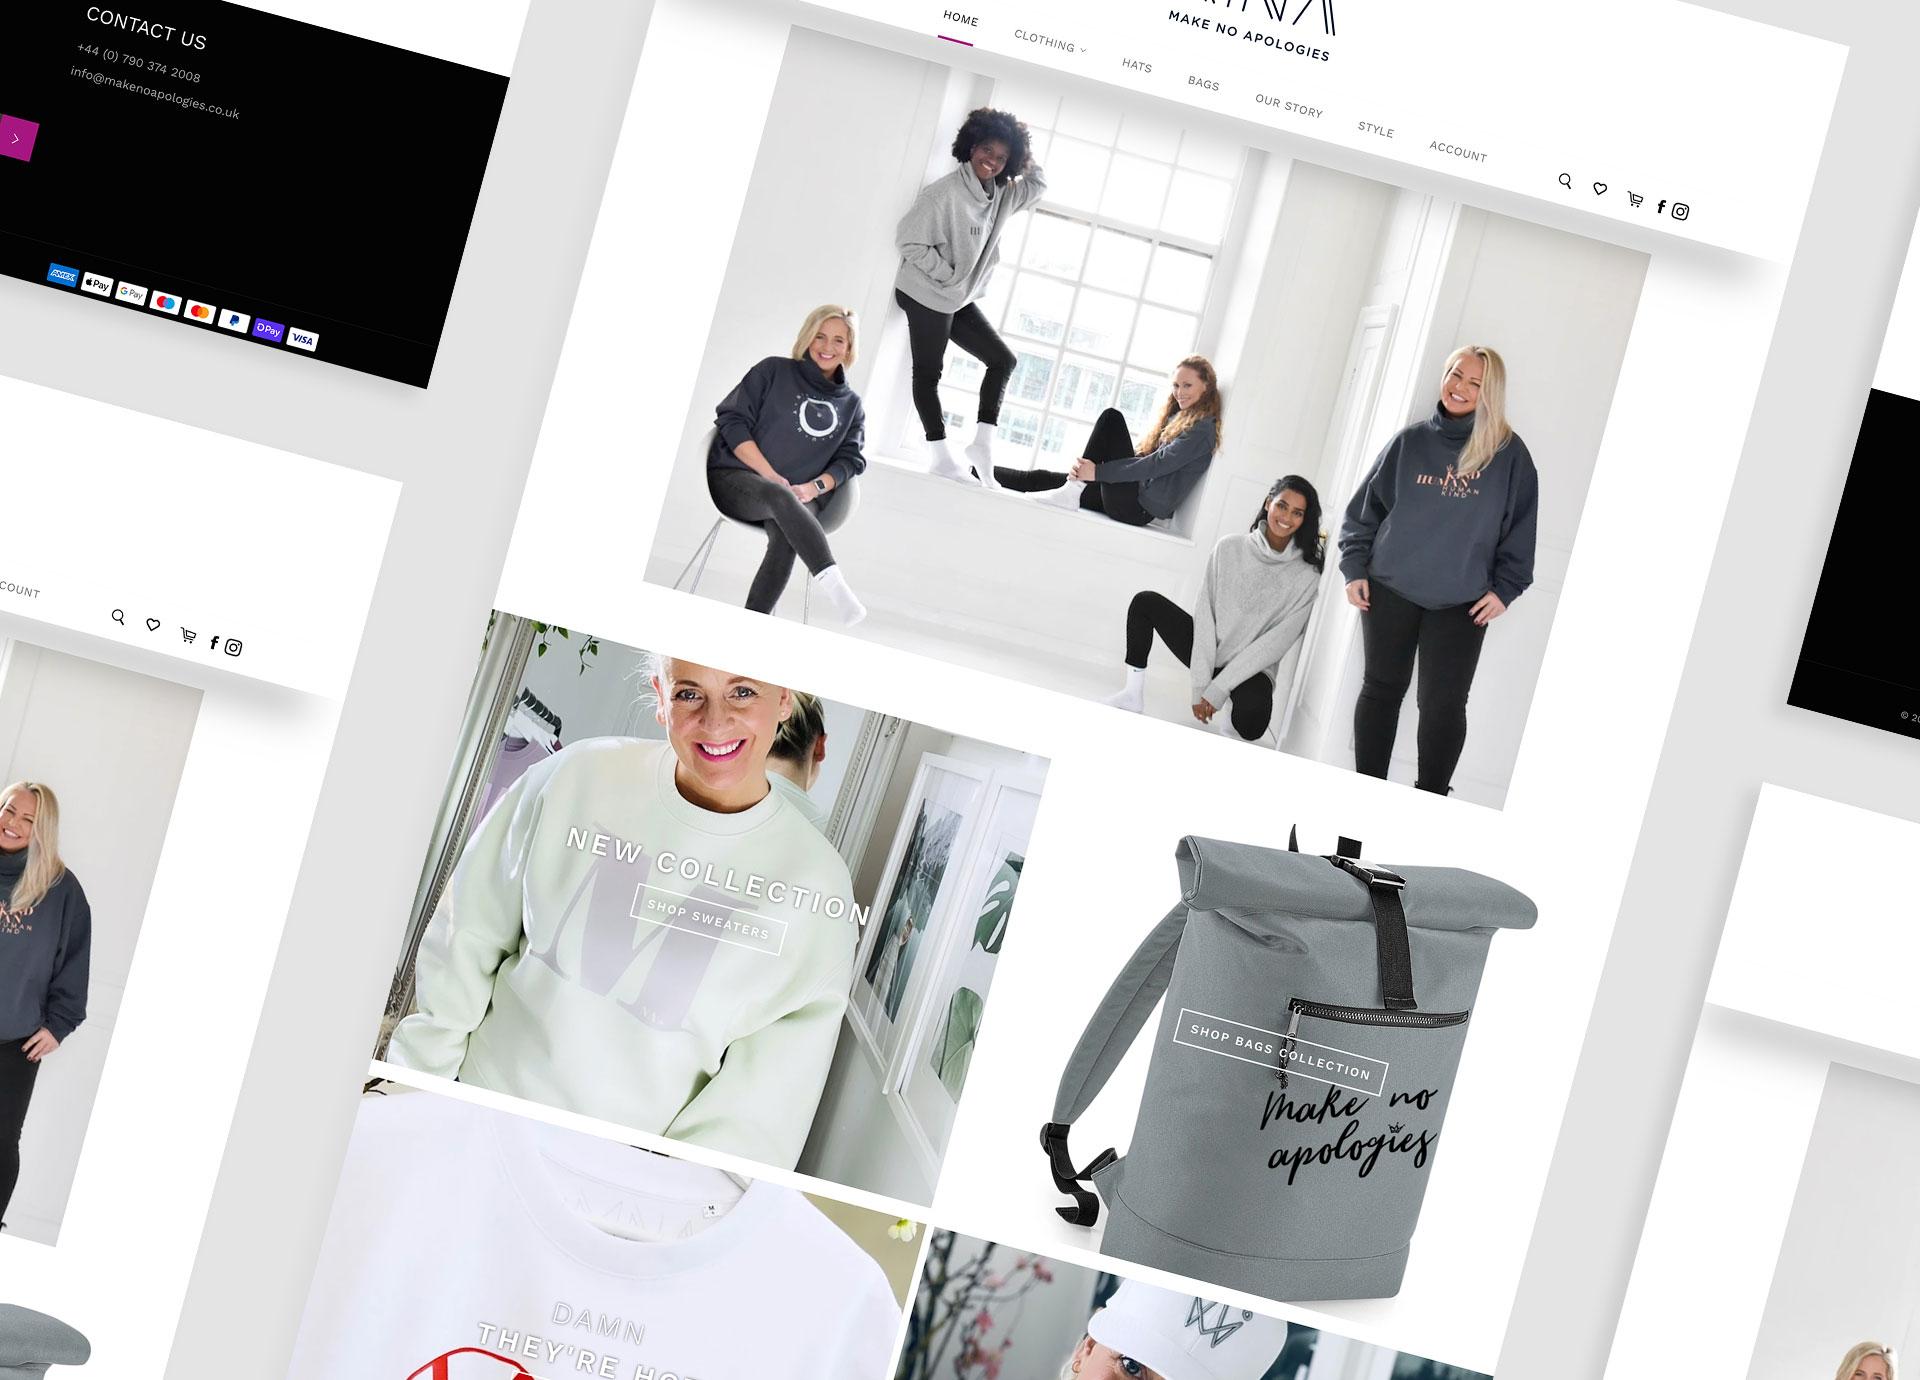 Make No Apologies website design by Sleeky